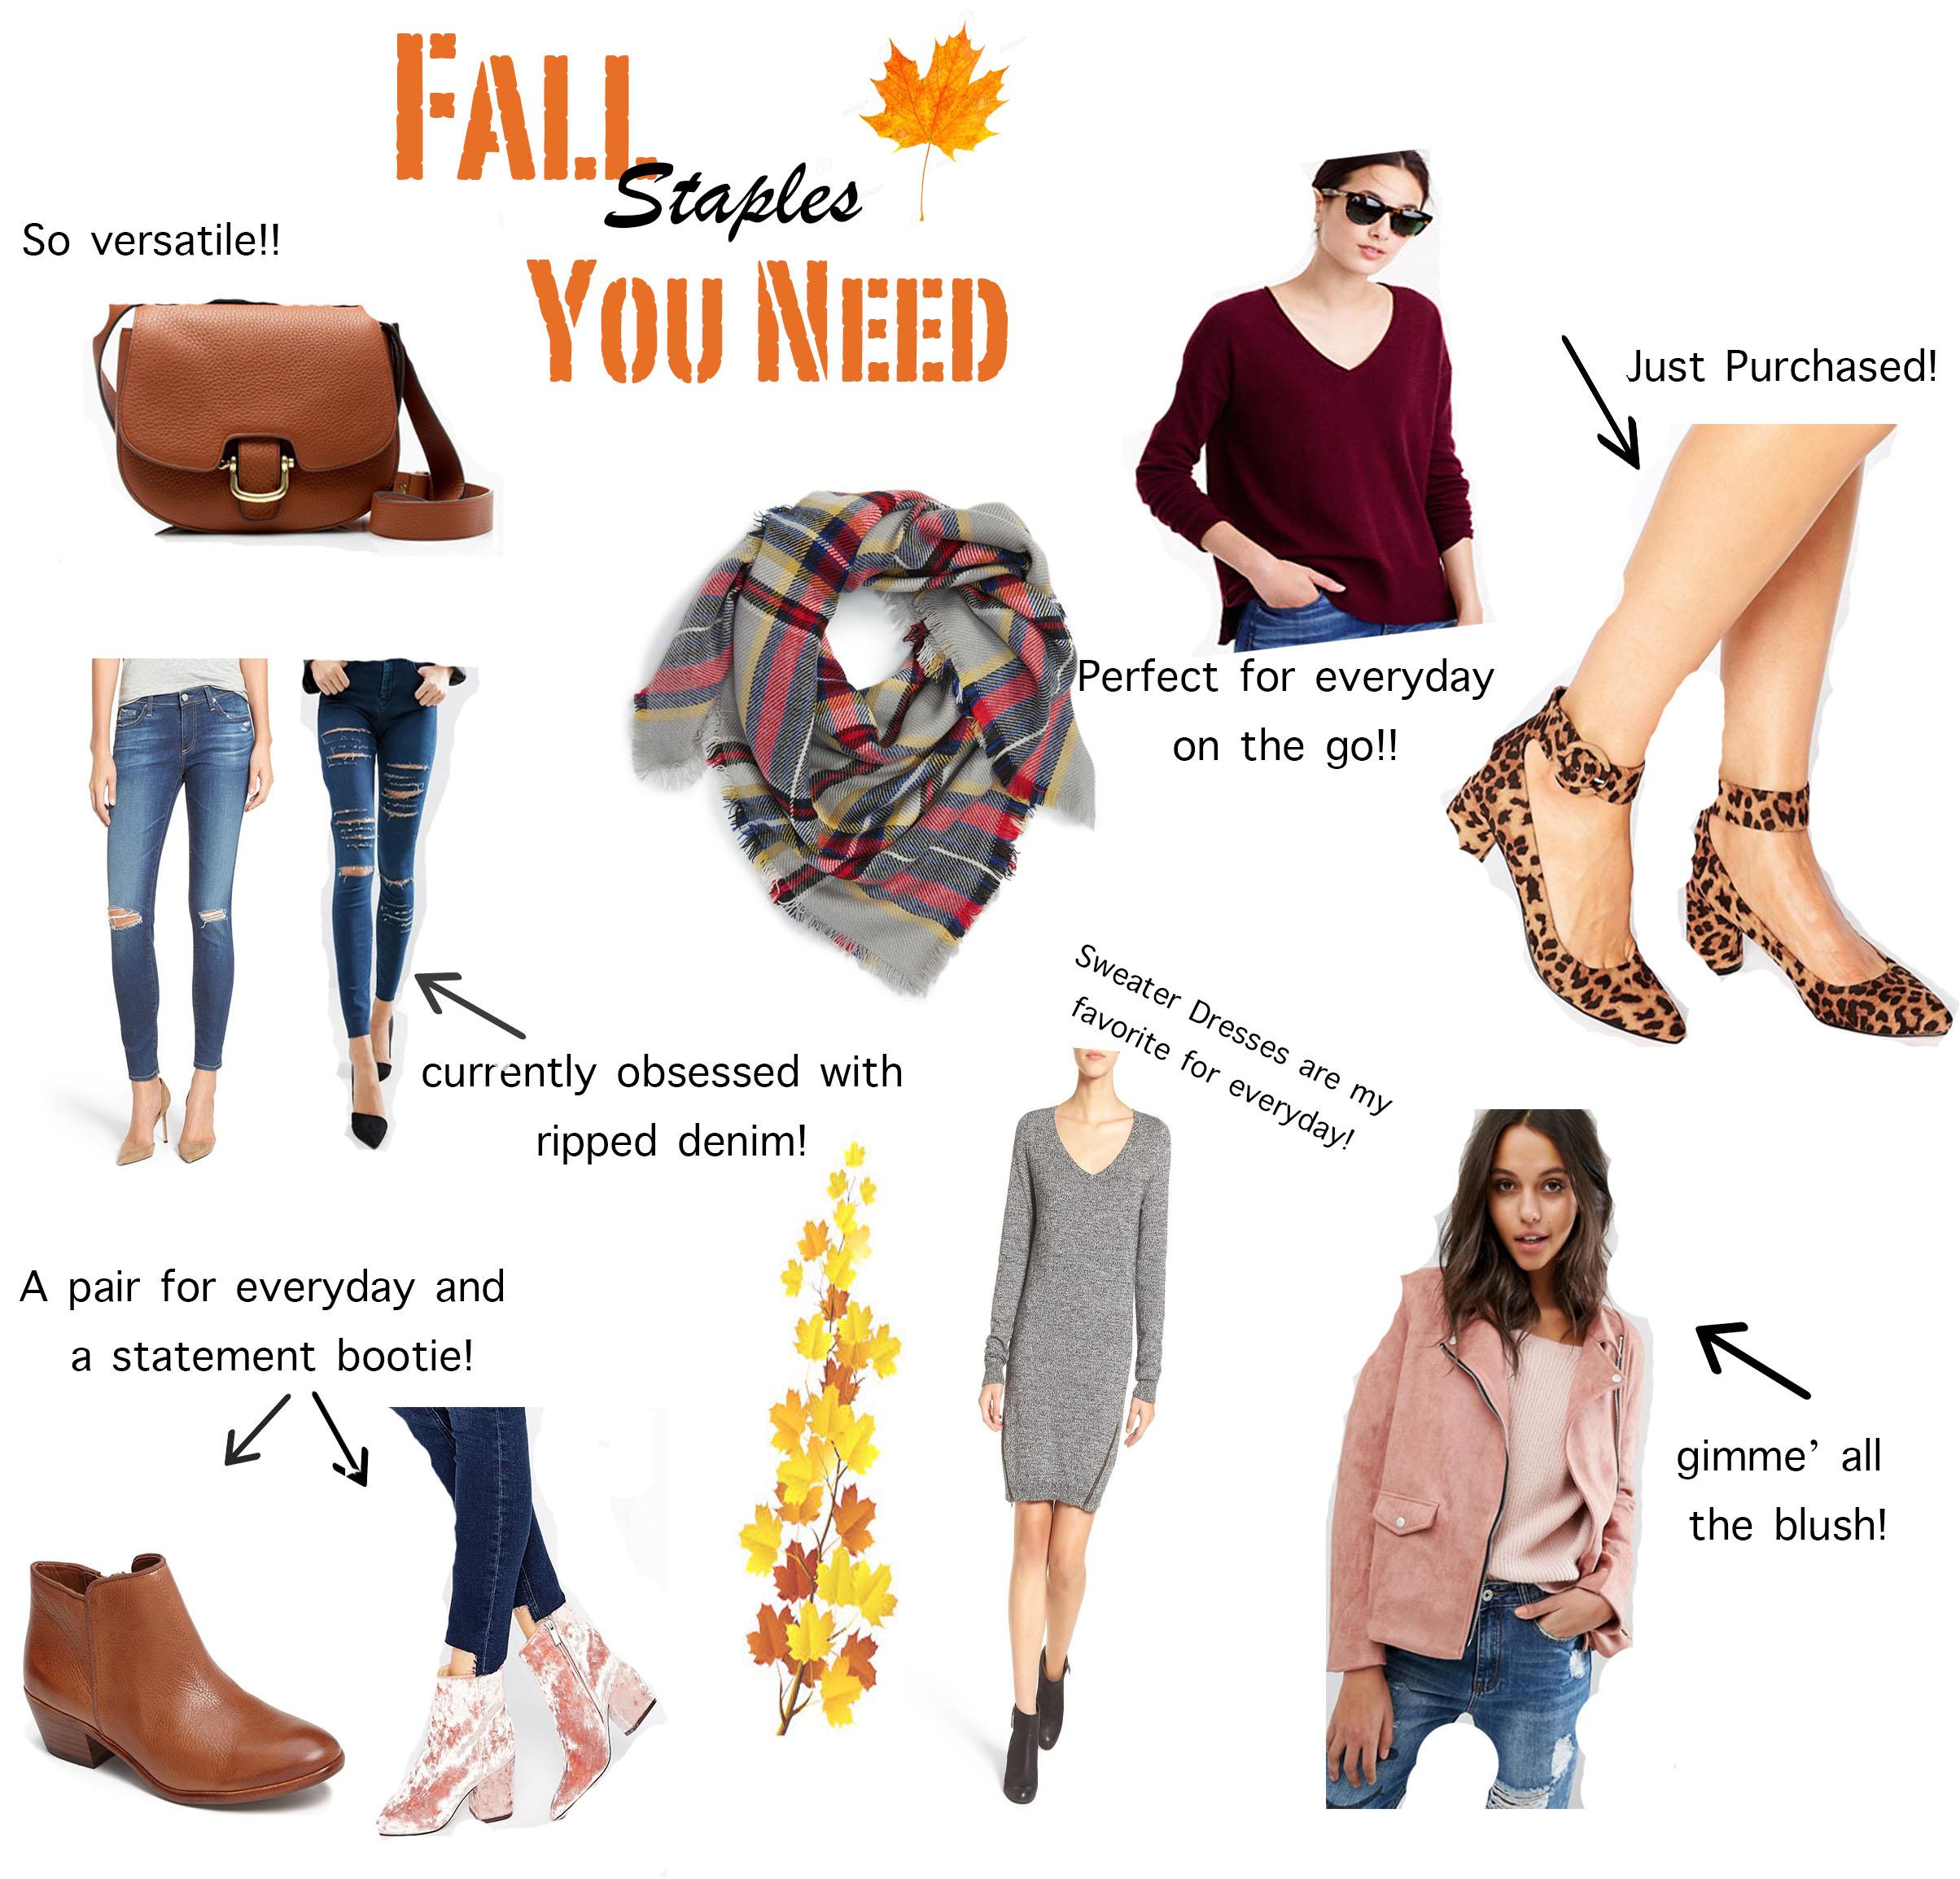 Fall Staples Everyone Needs